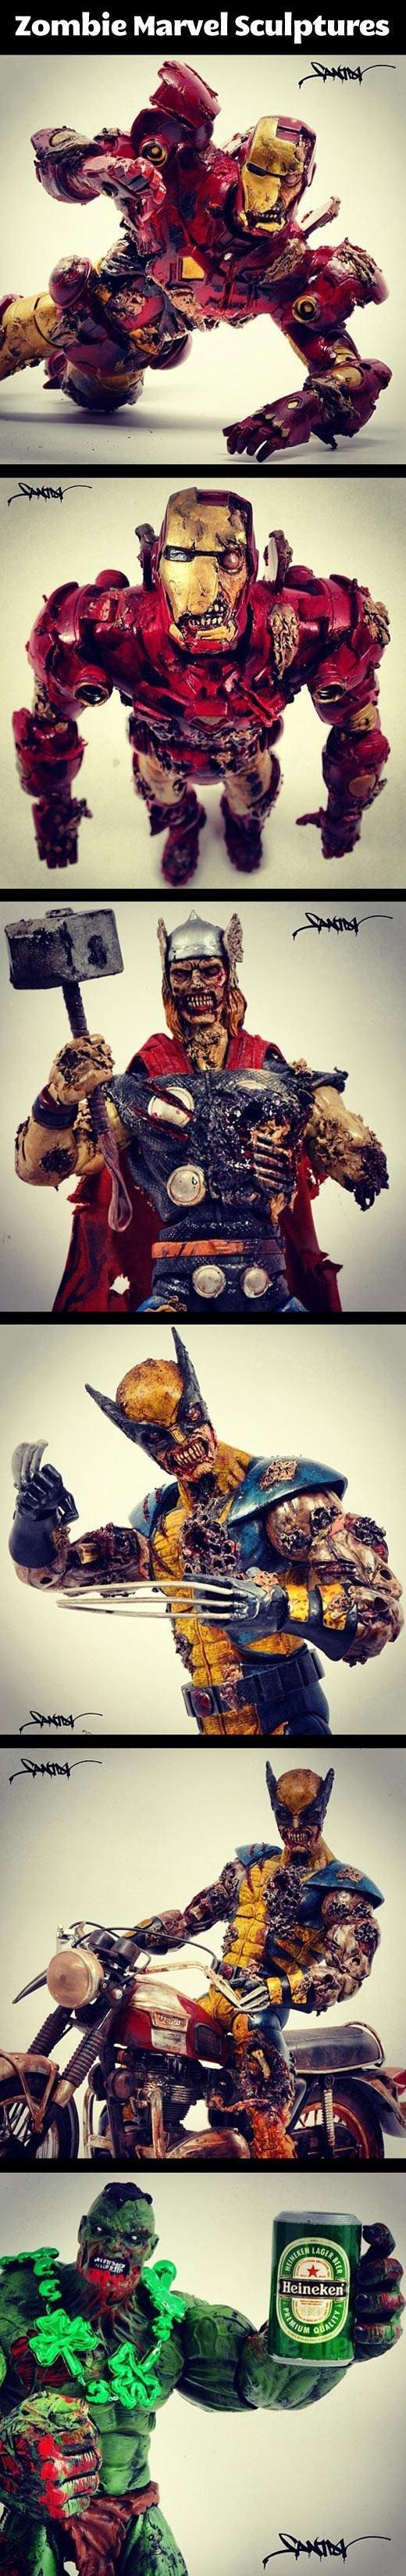 Zombie Marvel. . Zombie Marvel Sculptures. i kept hoping for deadpool...